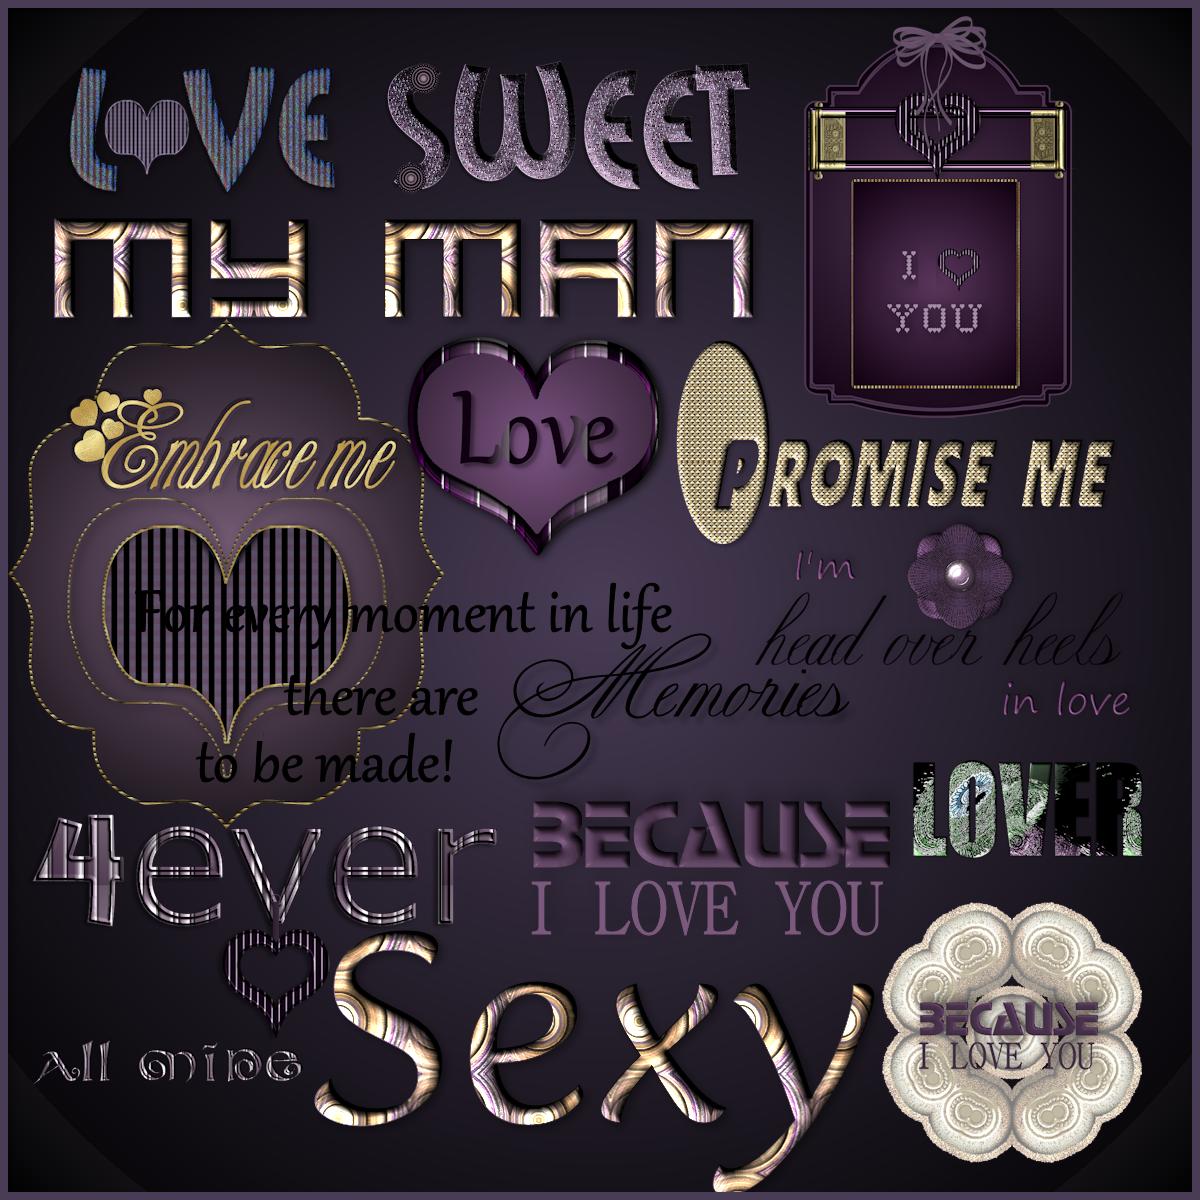 http://4.bp.blogspot.com/-l-eR55Mlvp8/Uxzx01DhFLI/AAAAAAAAEXs/v6KEGbZGWDg/s1600/purple_elegance_wordart_rainy.png